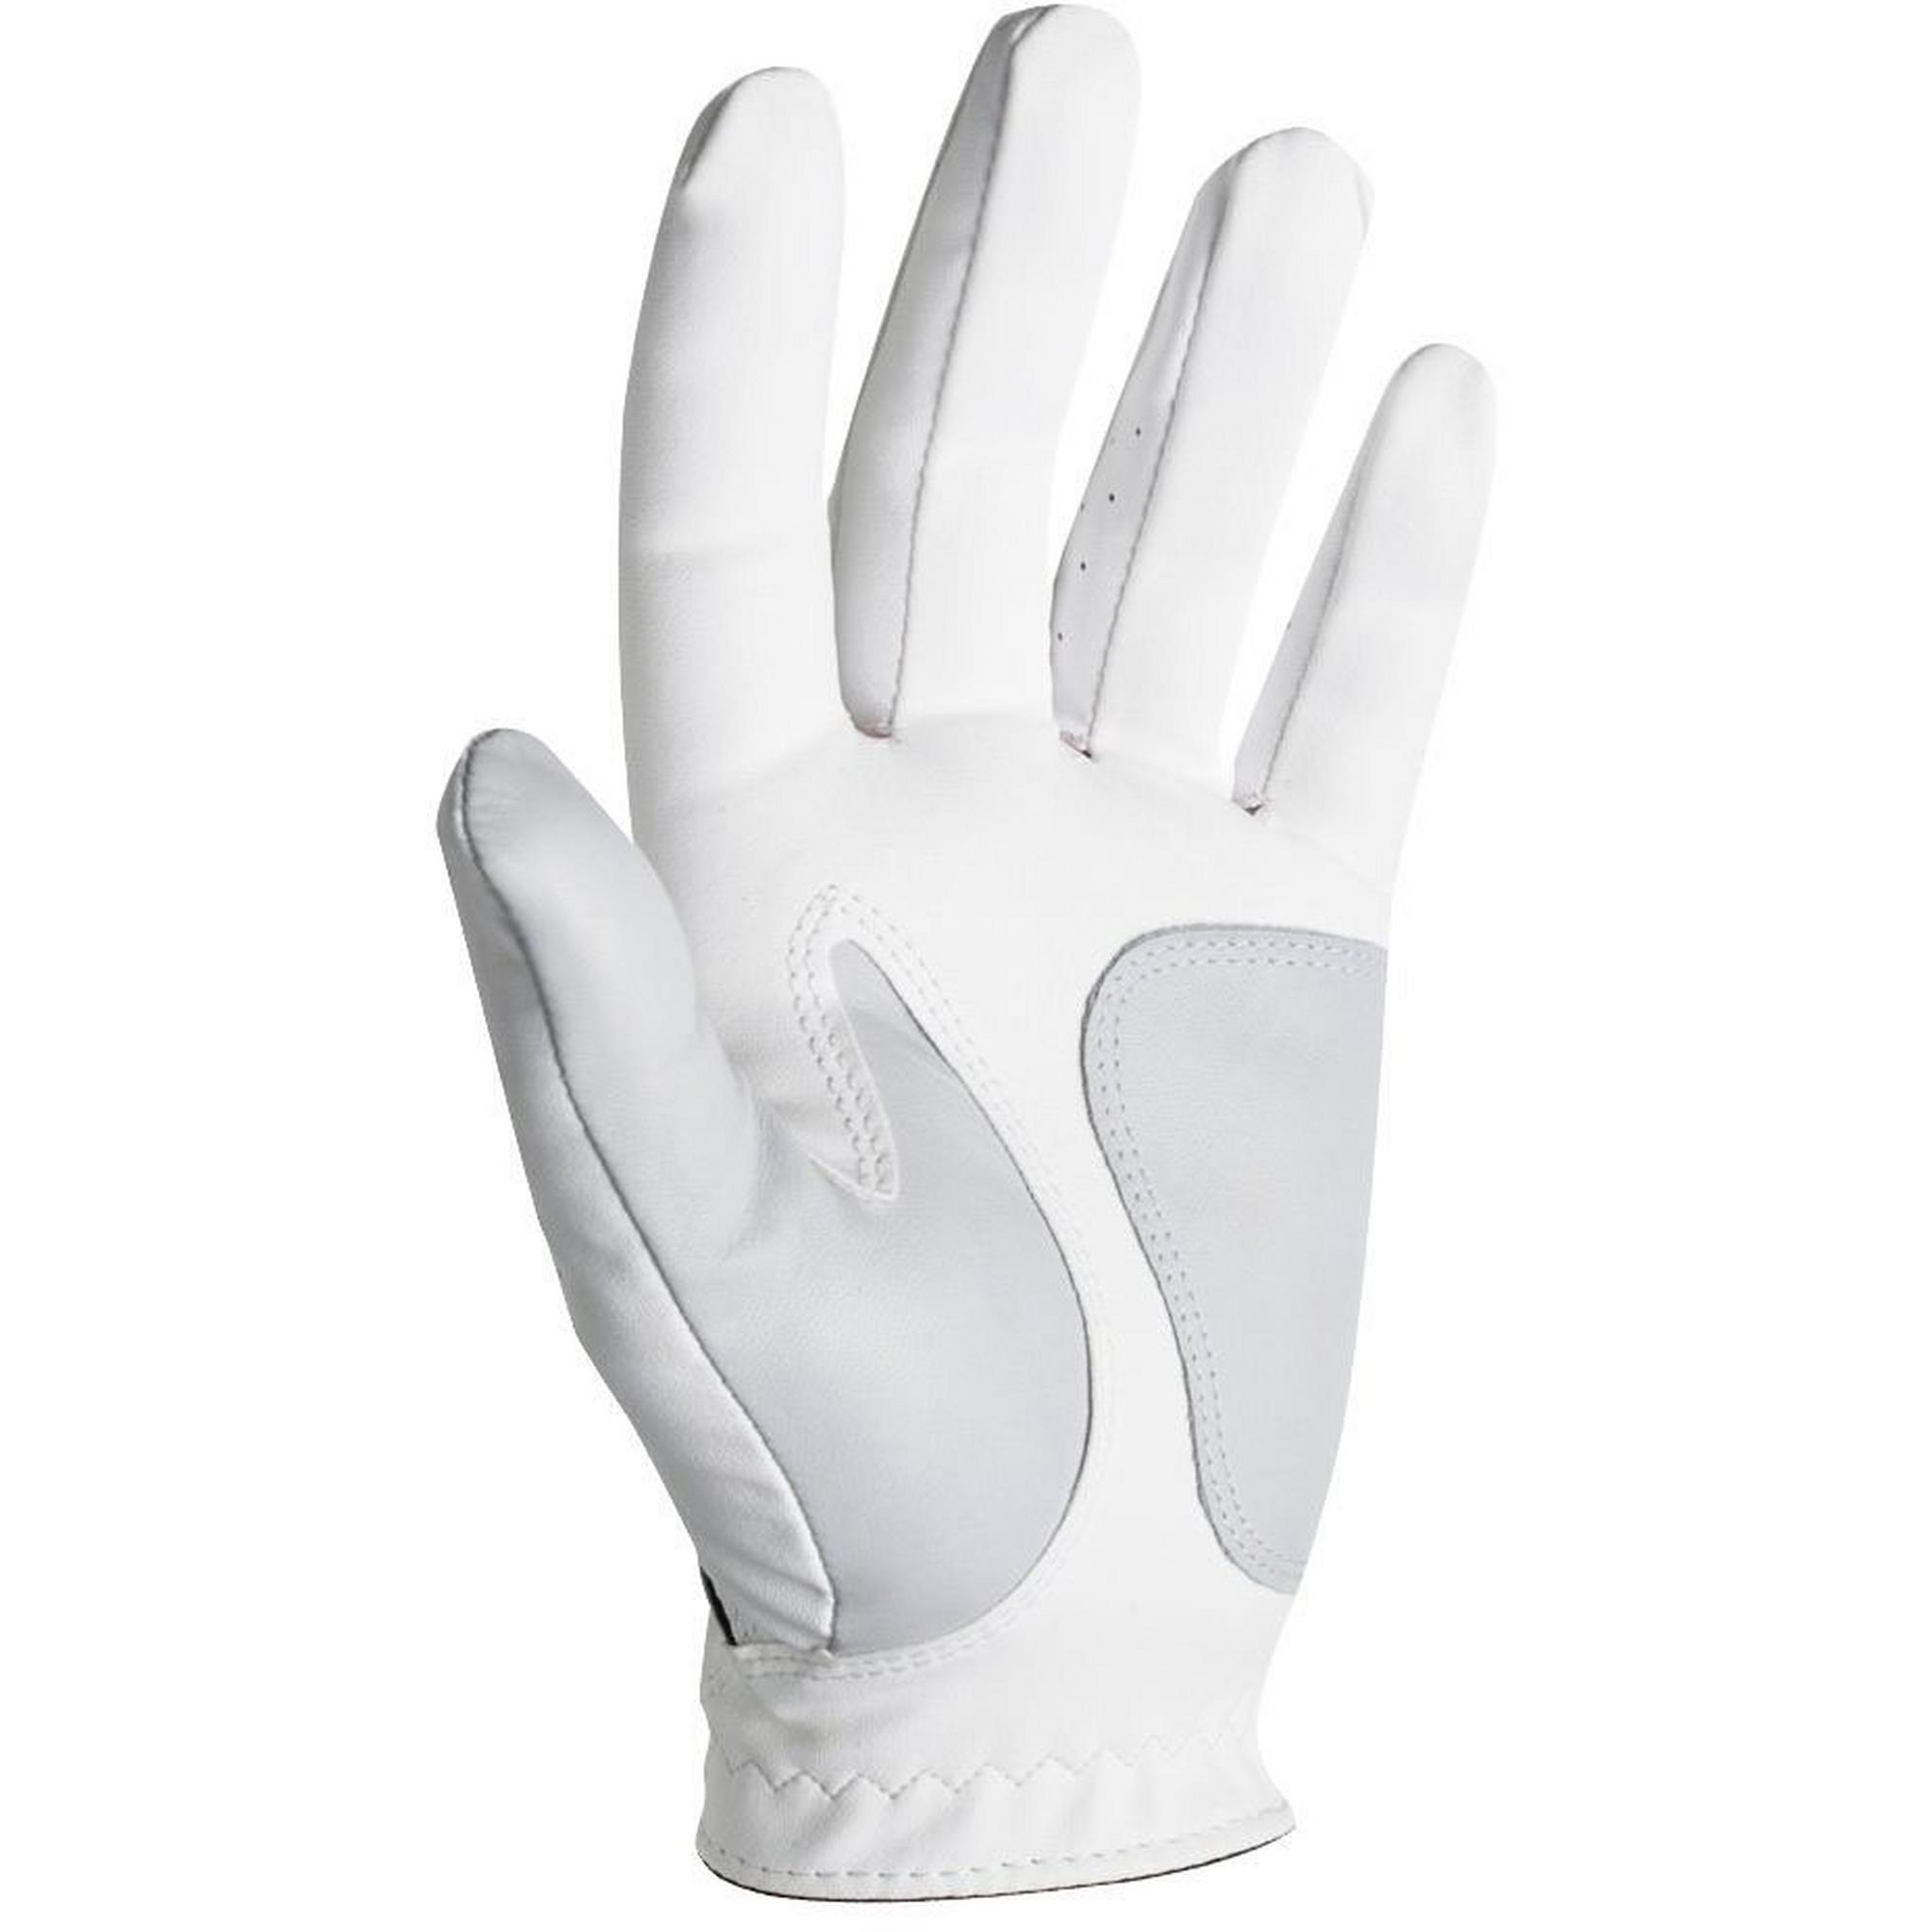 WeatherSof Mens Golf Glove